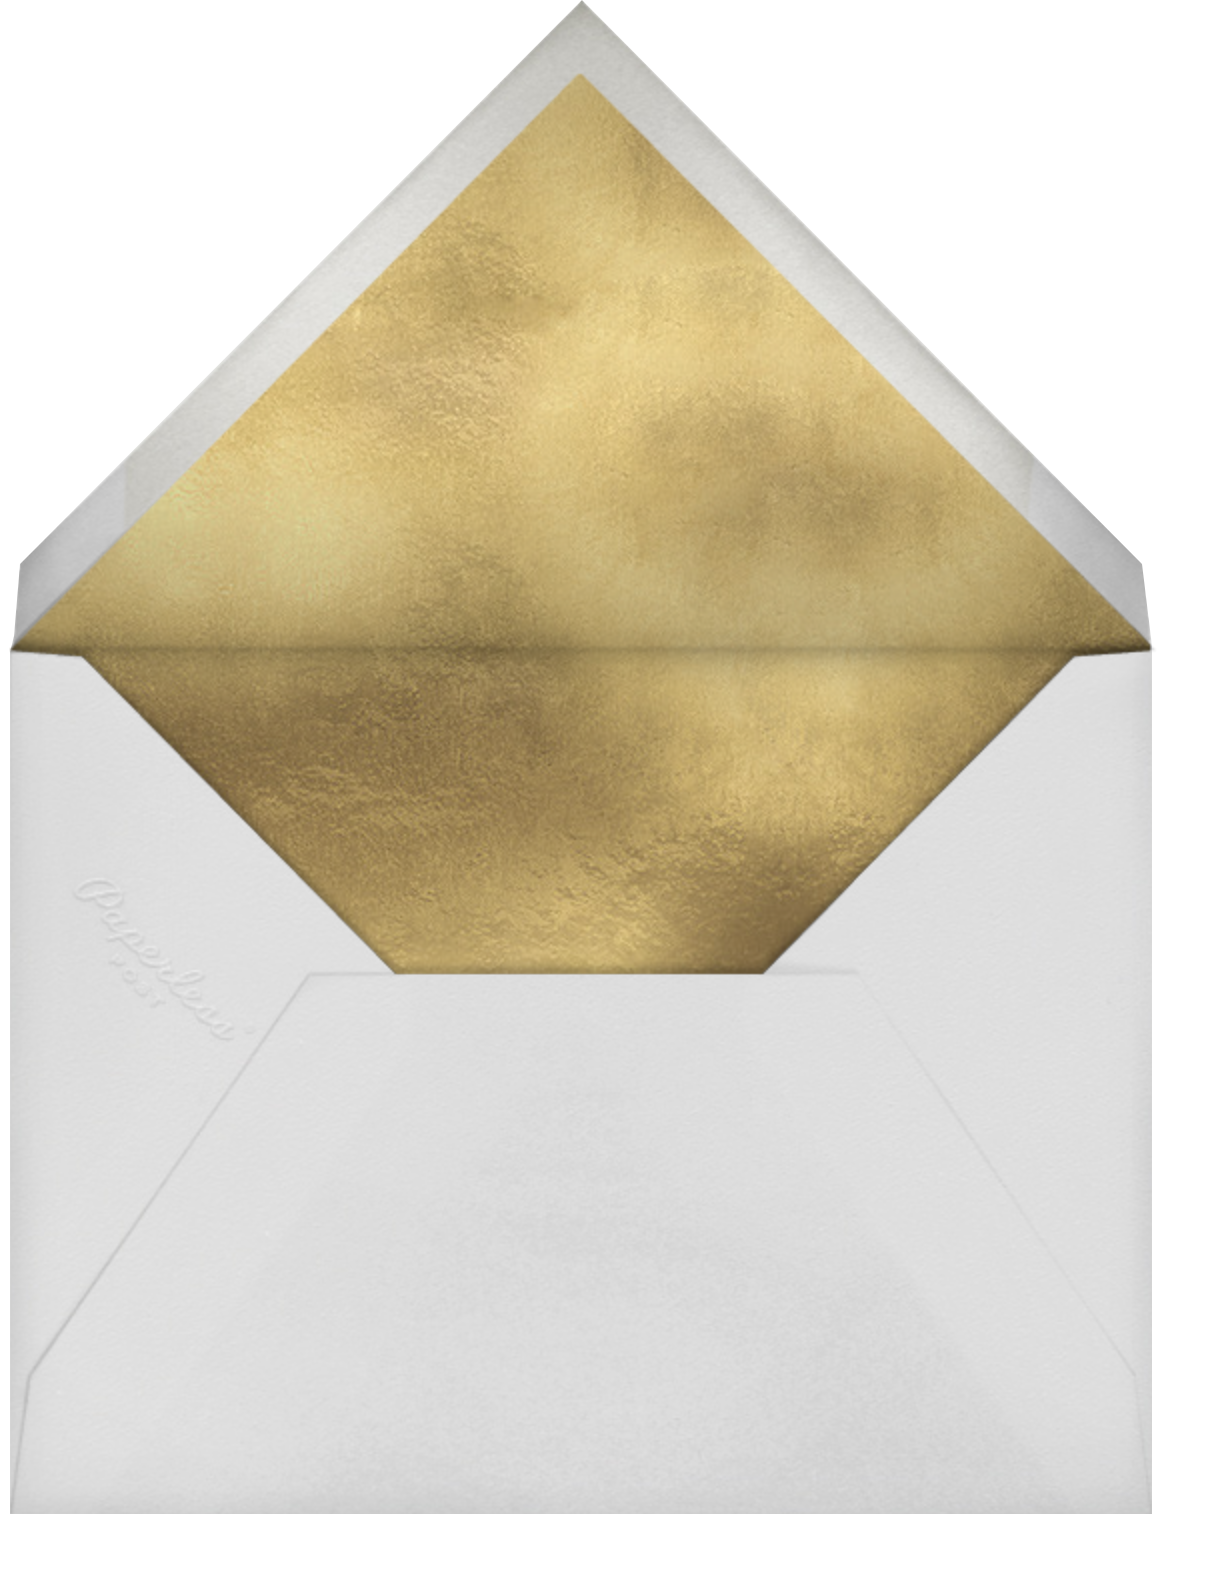 Hex Photo Frame - Kelly Wearstler - Bridal shower - envelope back